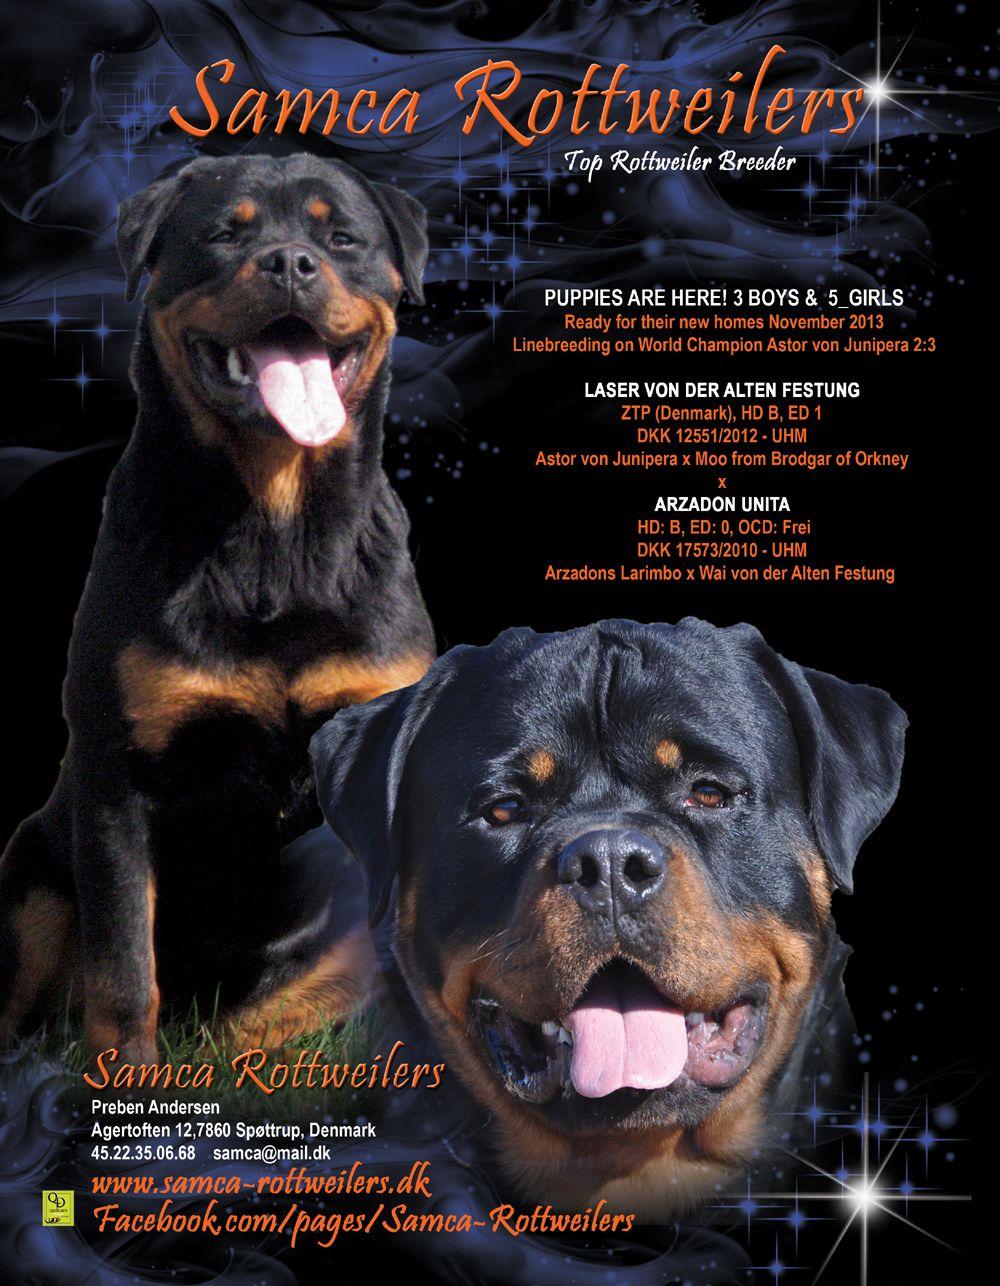 Puppies Are Here 3 Boys 5 Girls Samca Rottweilers Preben